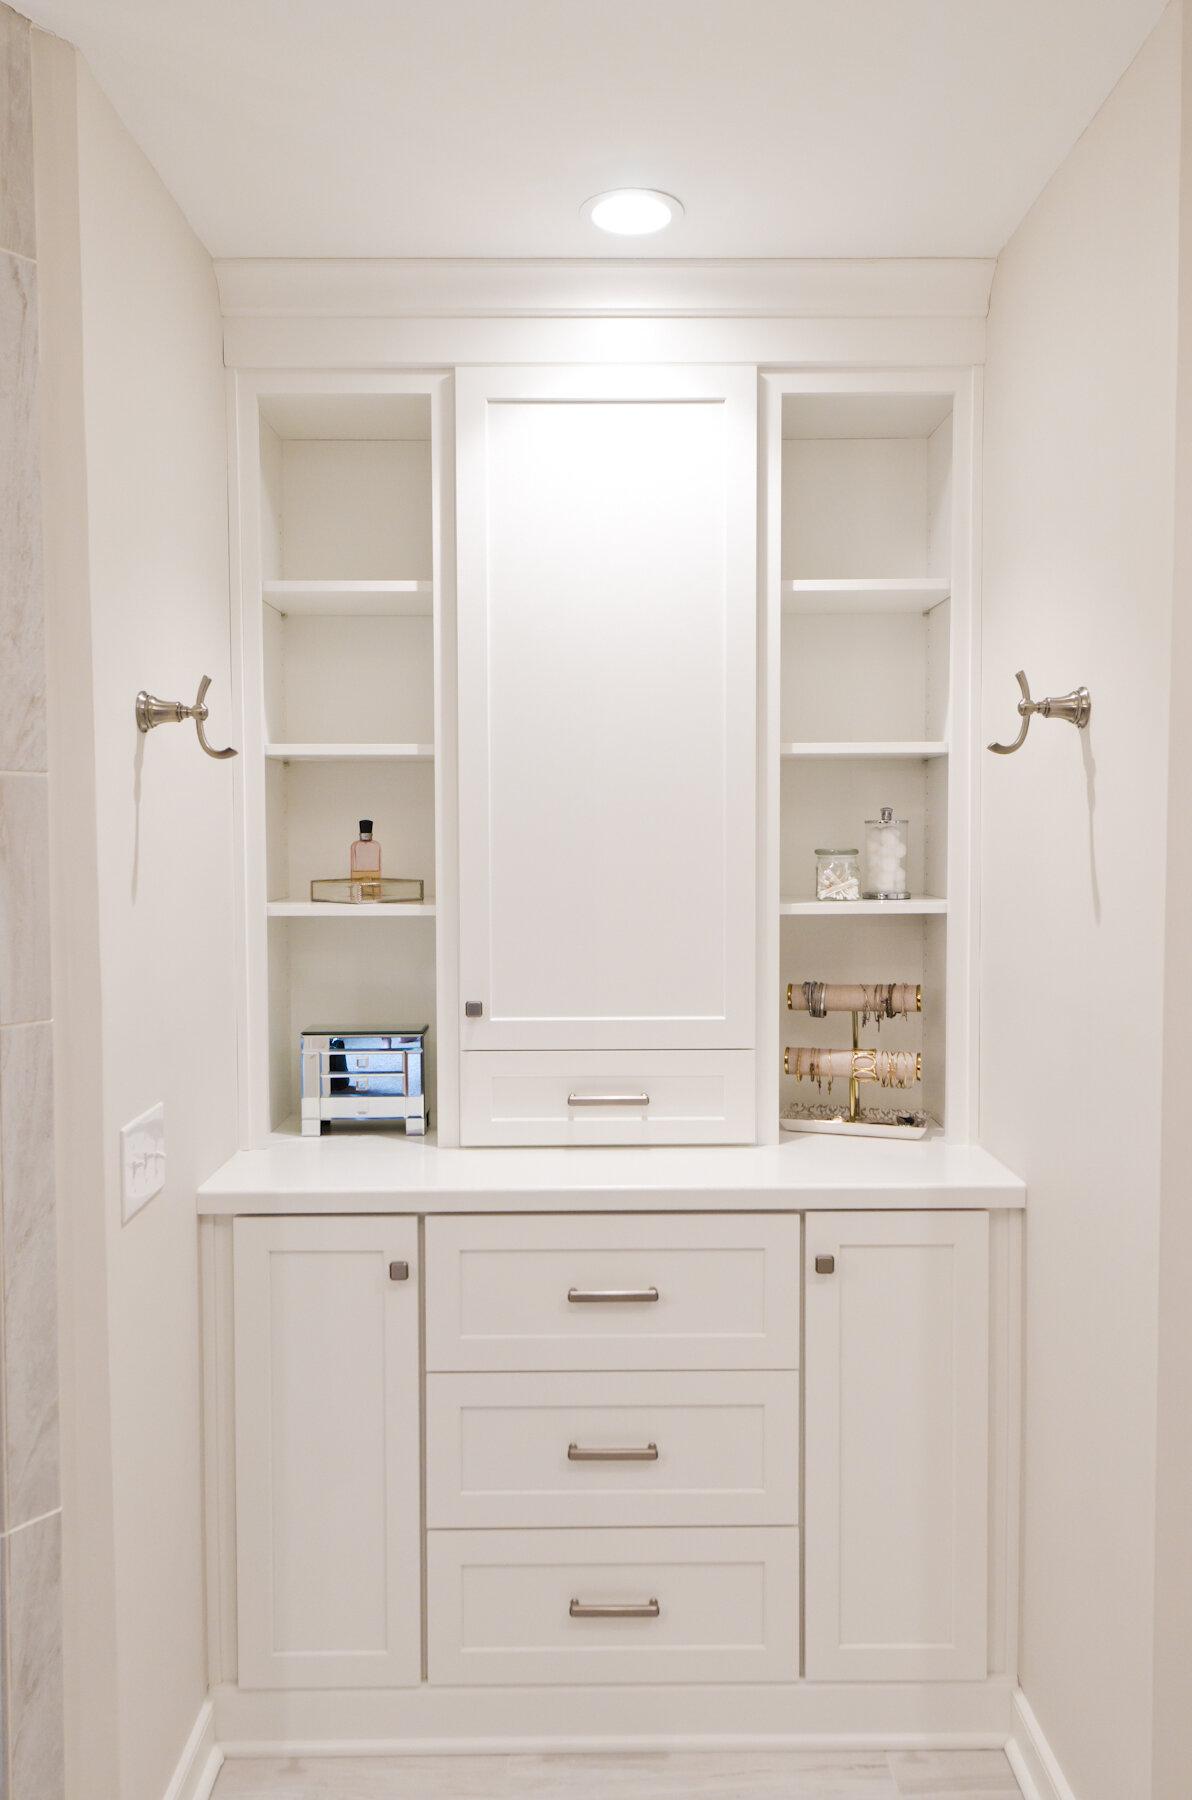 2019_CLI_Richmond_Virginia_Interior_Designer_Contractor_West_End_Master_Bathroom_Ryther-31.jpg